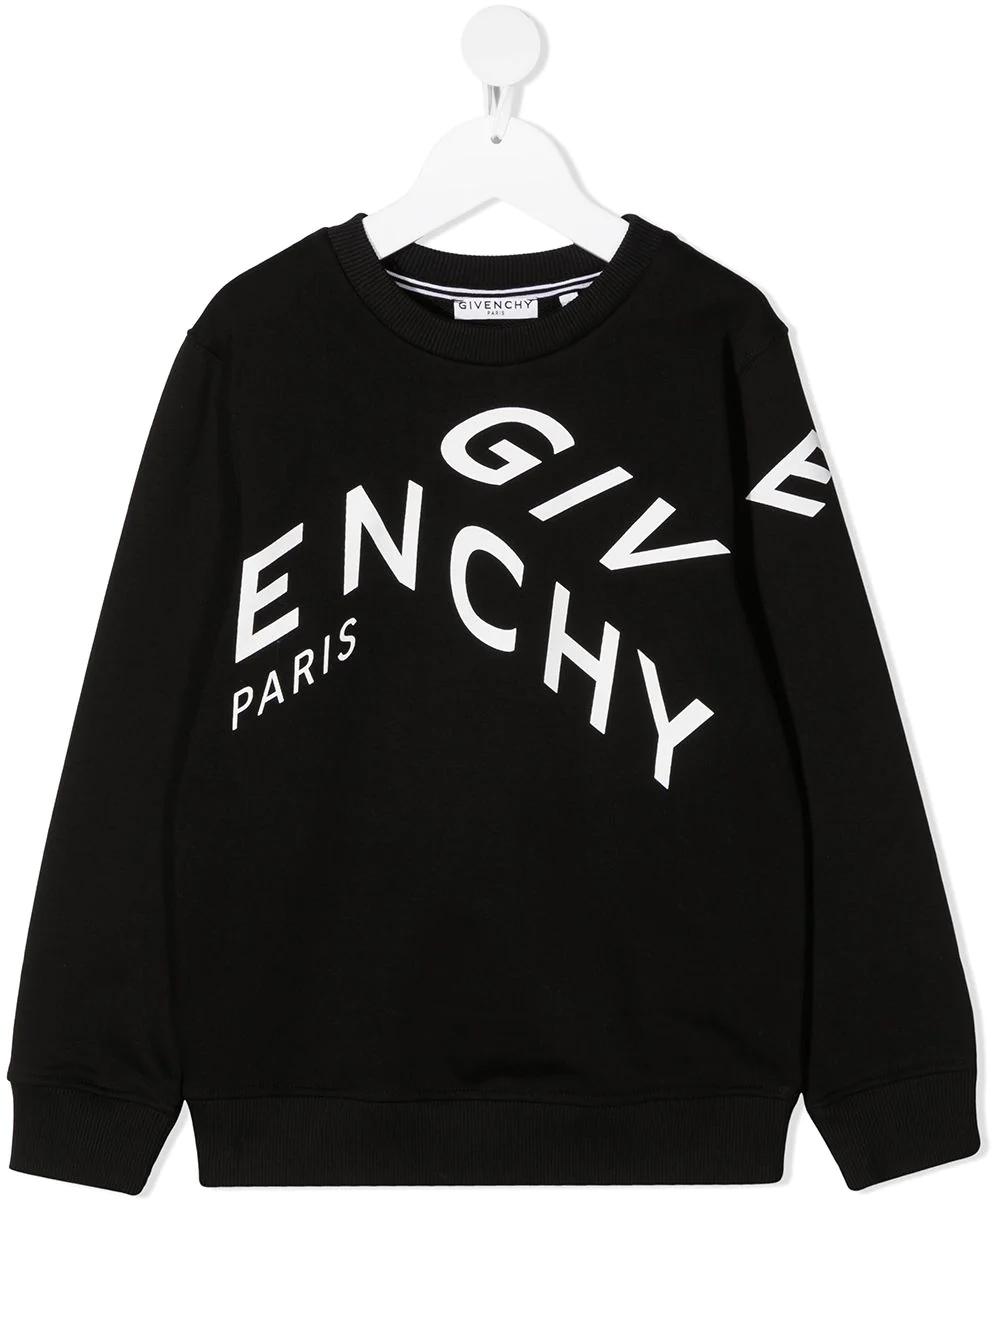 Sweatshirt Givenchy kids  GIVENCHY KIDS | -108764232 | H2524009B